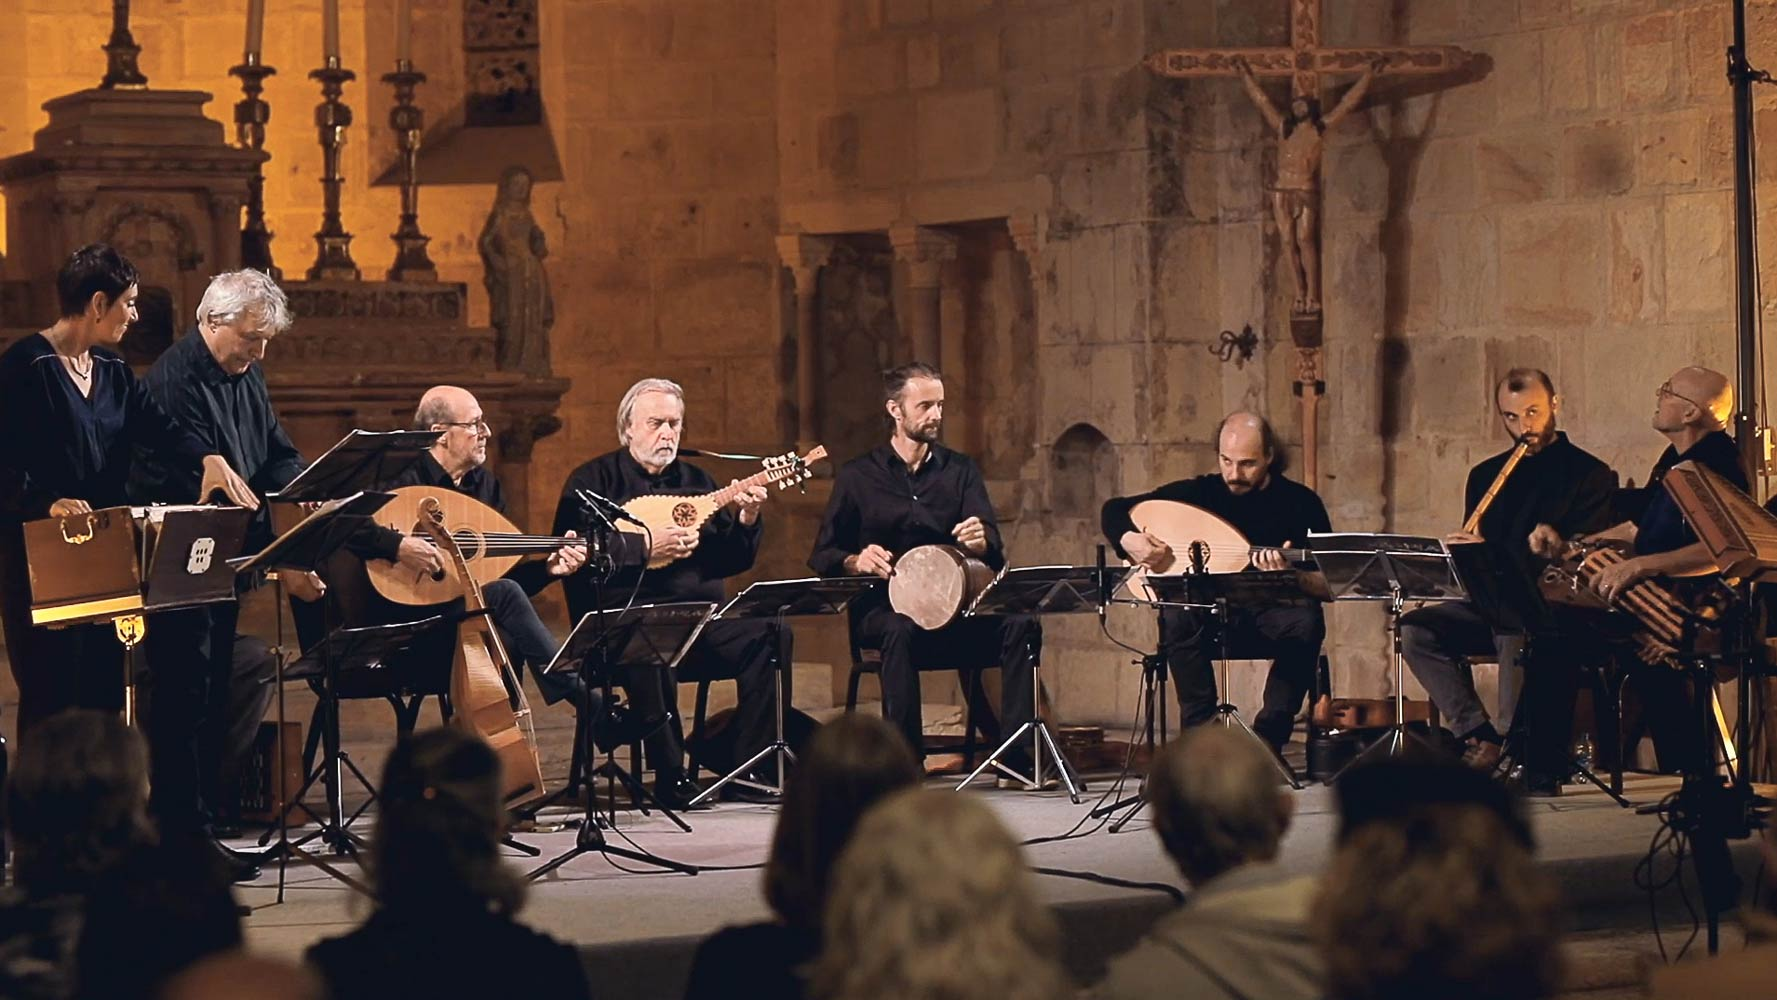 Abbaye de Fontfroide - Les Troubadours chantent l'Art Roman